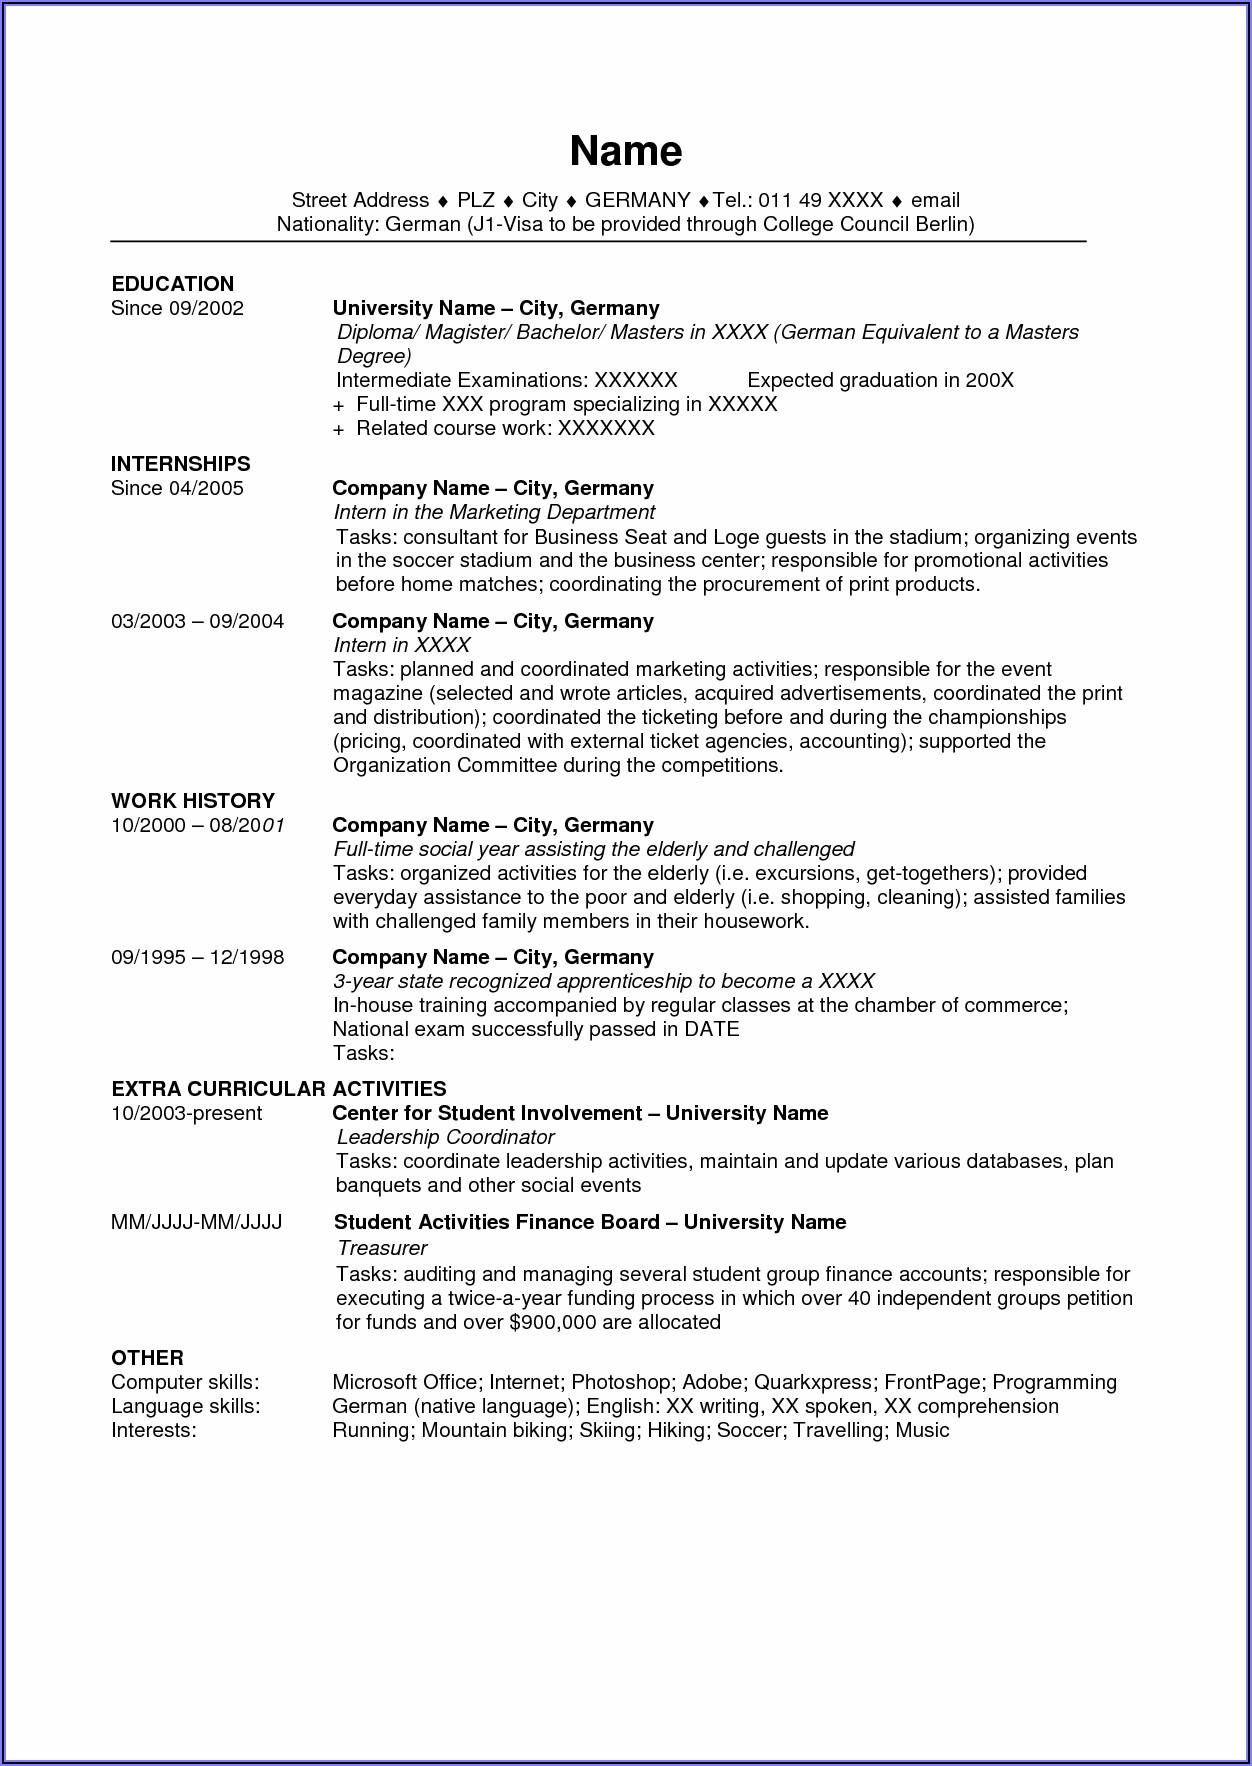 Curriculum Vitae Usa Template